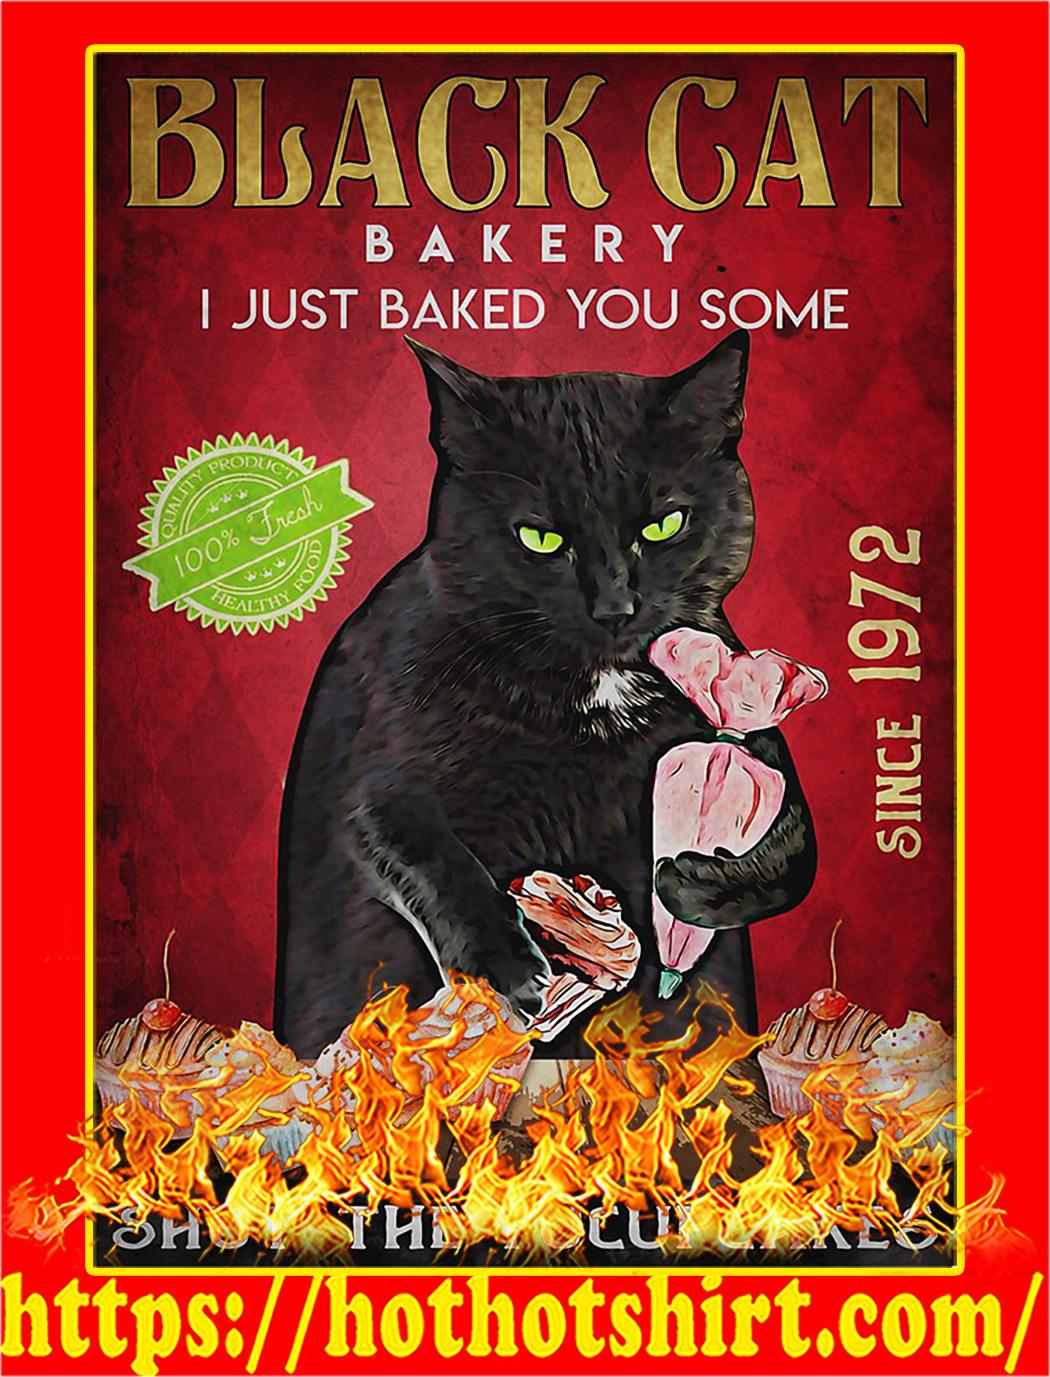 Black cat bakery shut the fucupcakes poster - A1